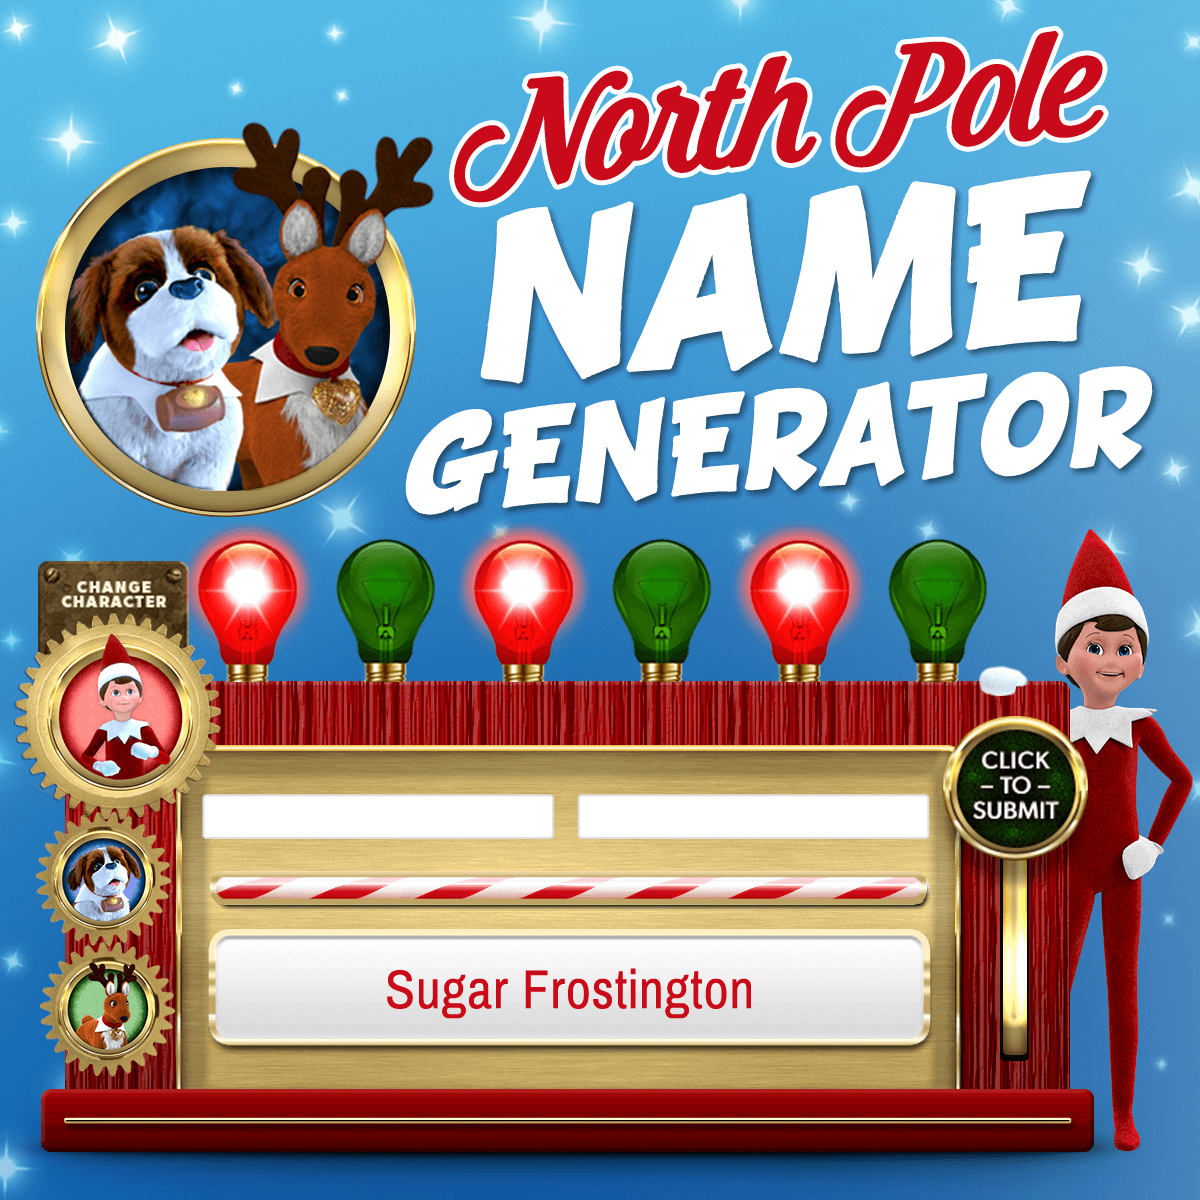 Fun Stuff for Kids Santas North Pole The Elf on the